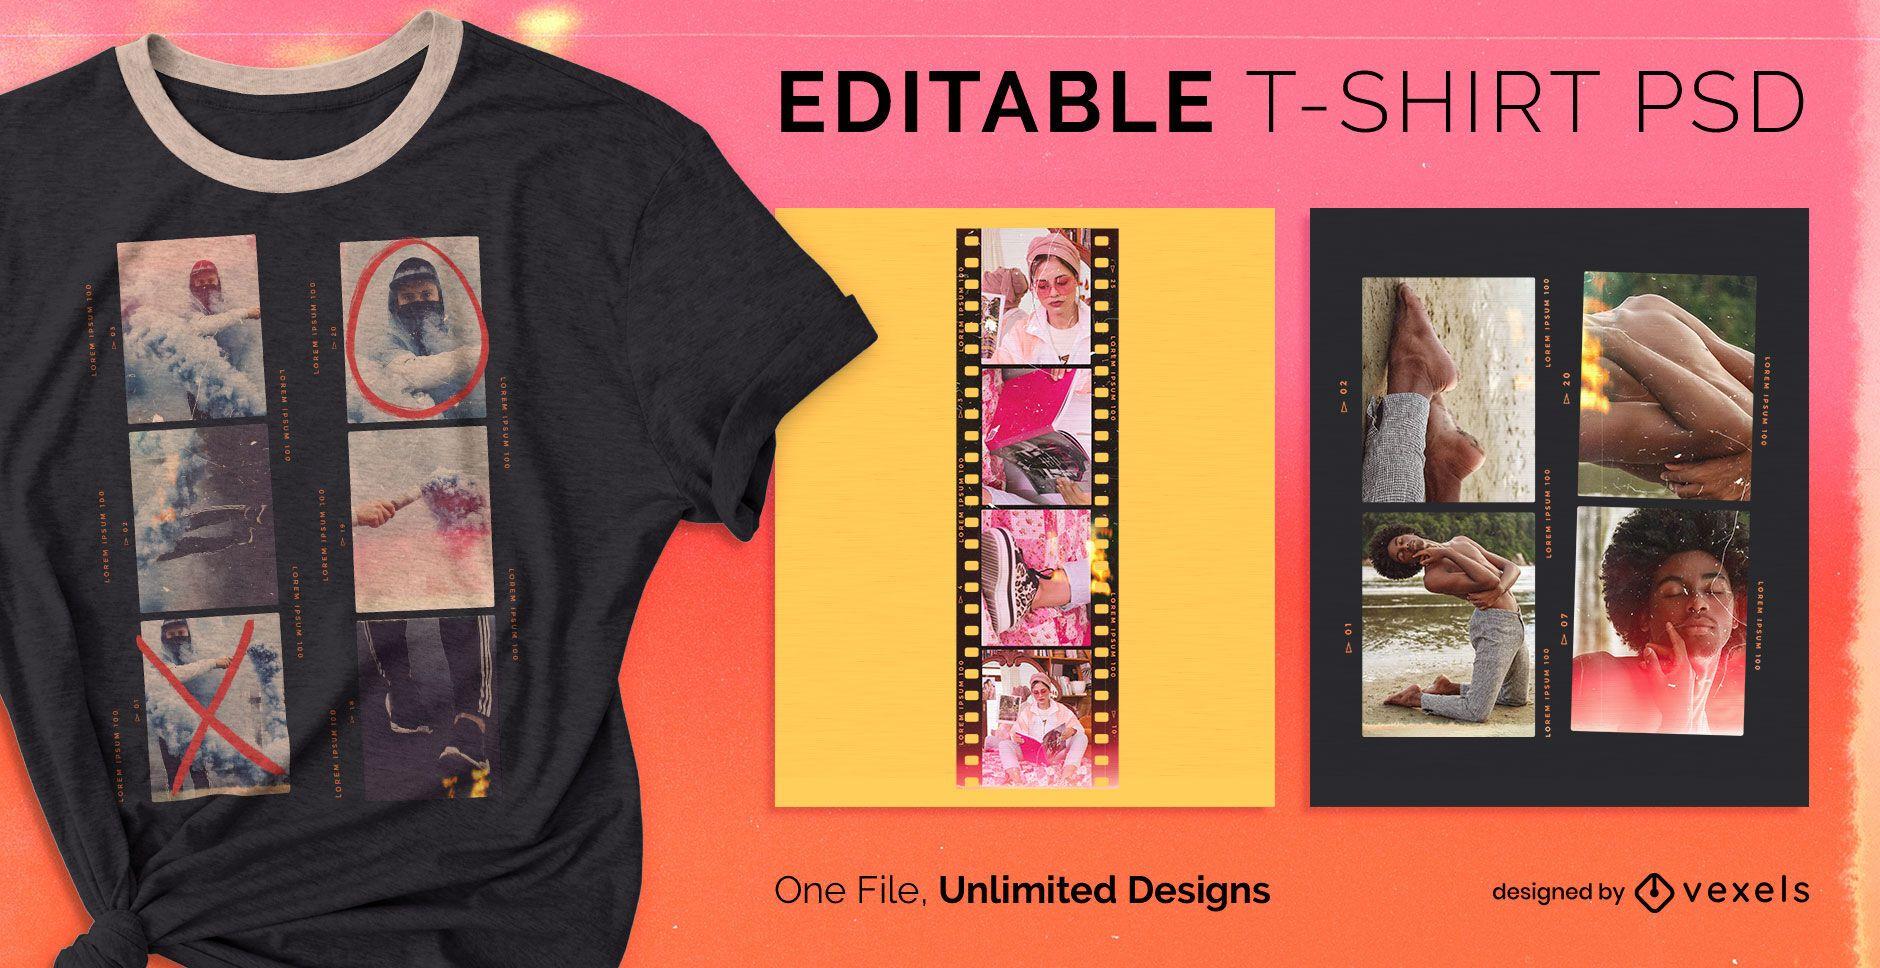 Film scalable t-shirt psd